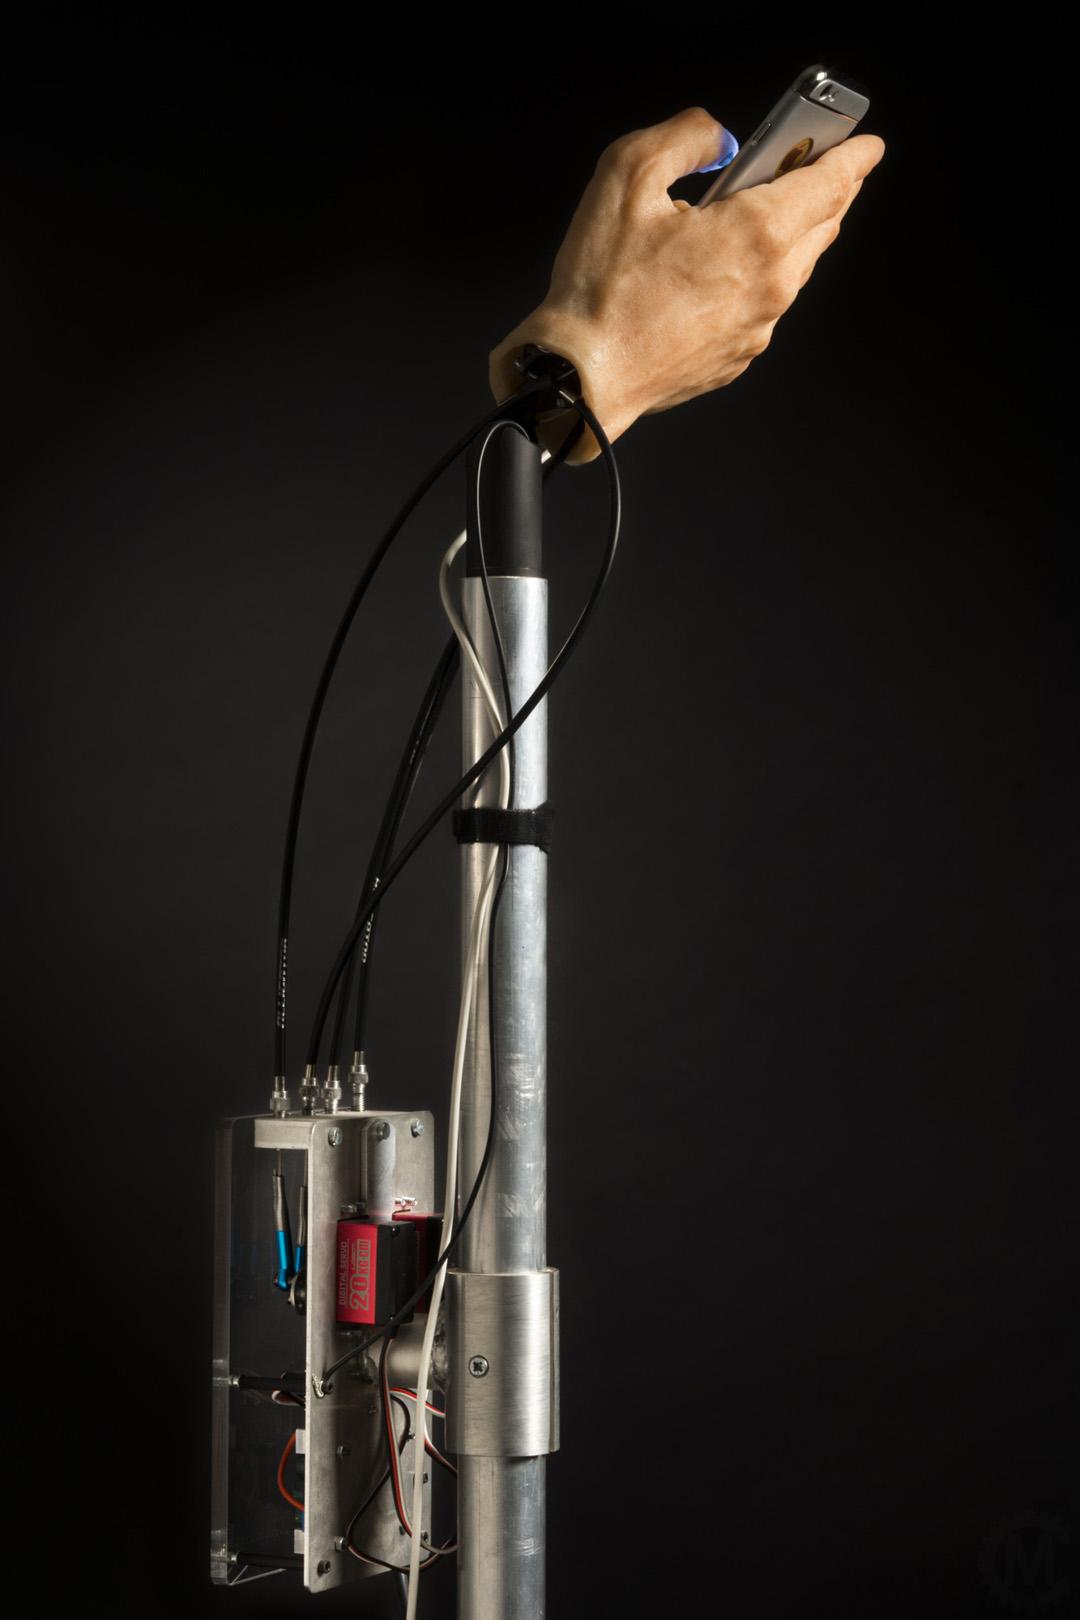 Miocugino Mano Animatronic Telefono Meccanismo Elettronica